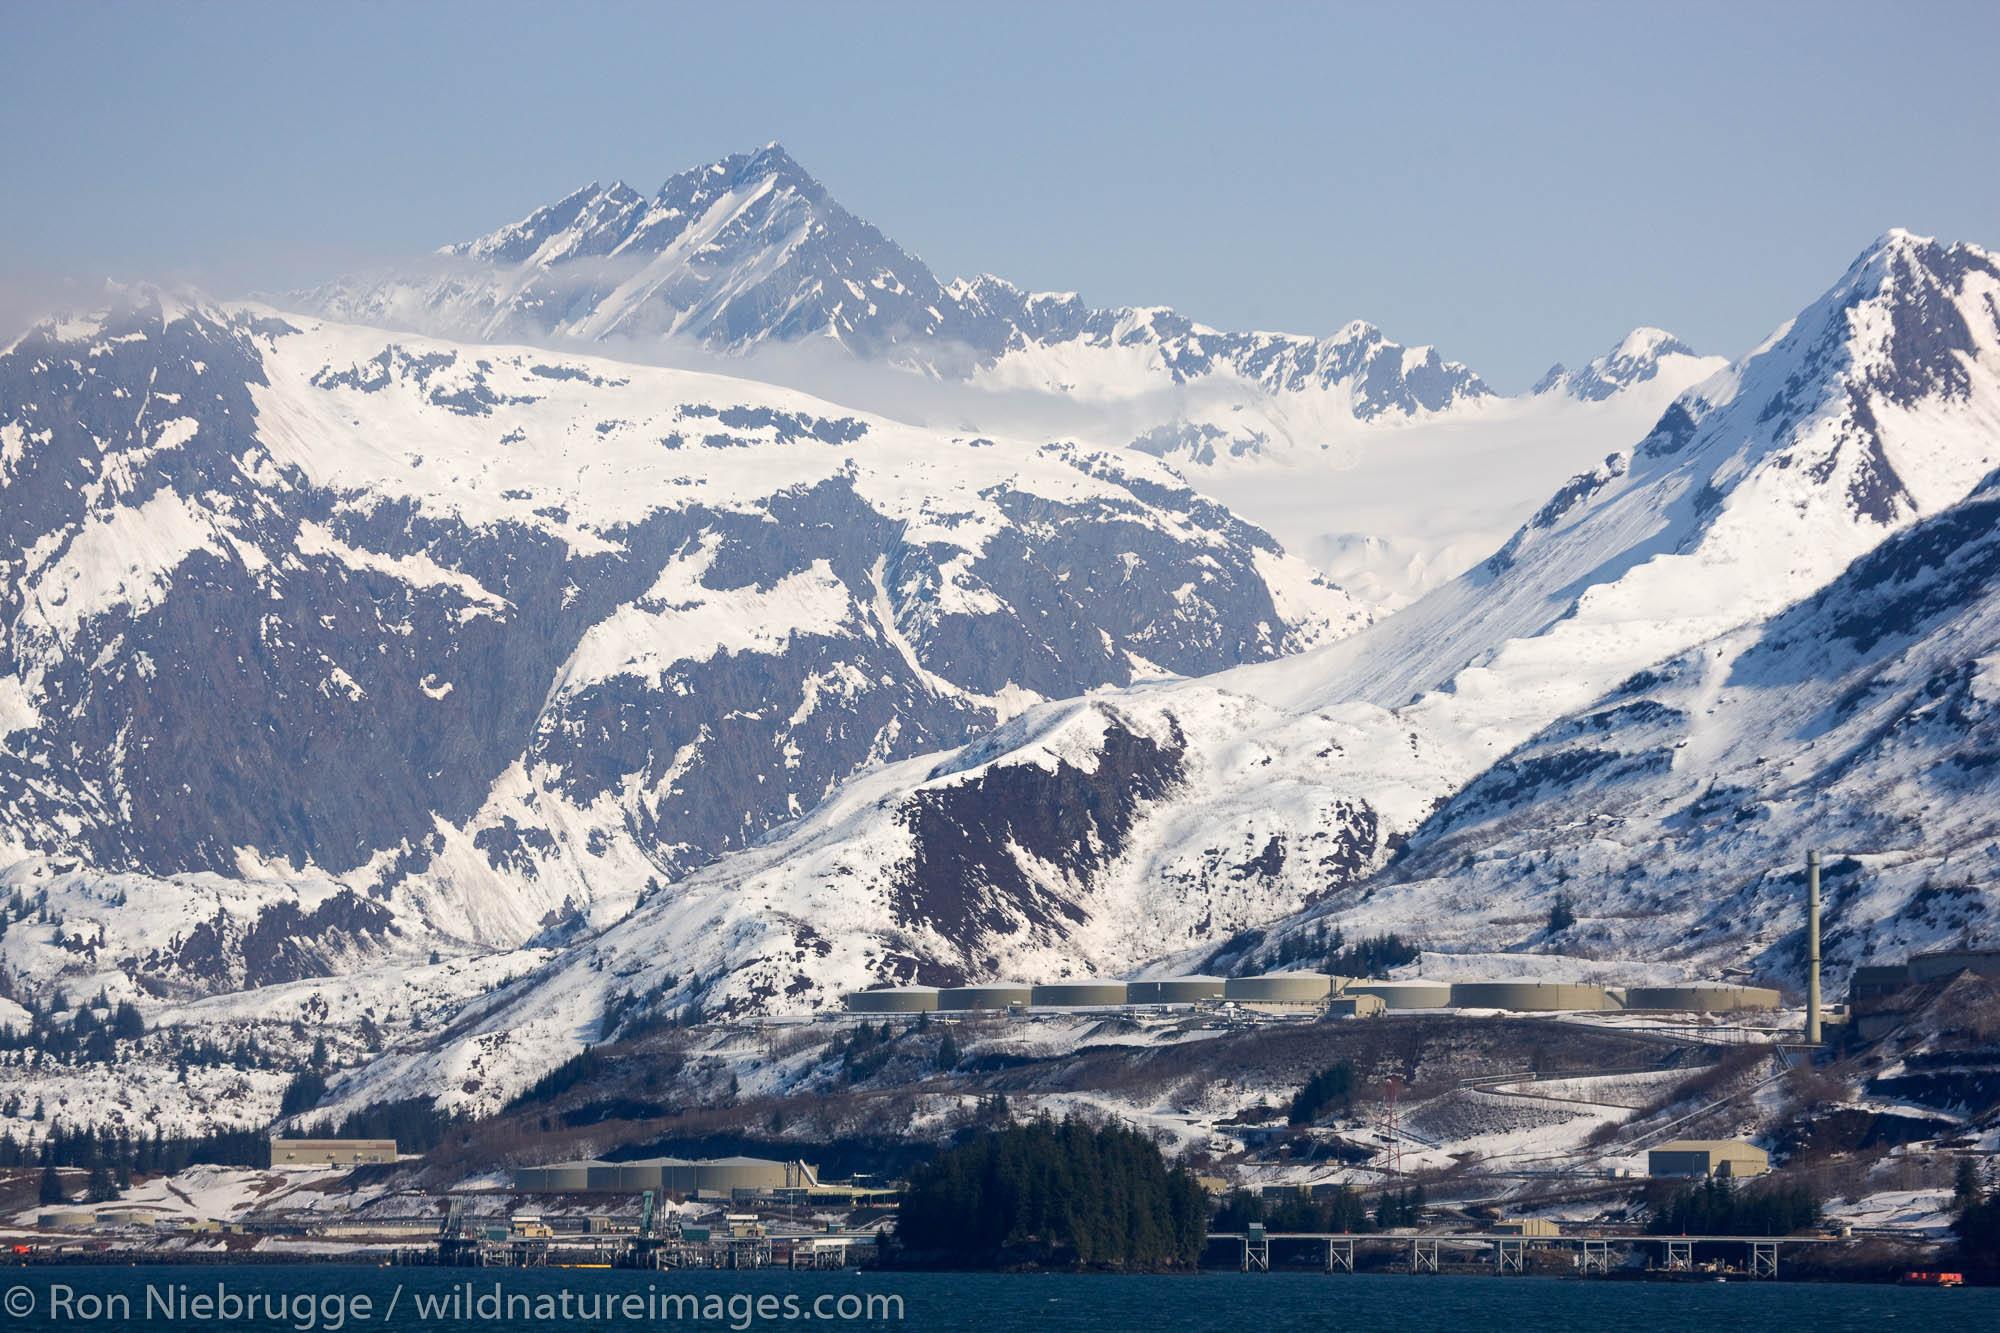 Trans Alaska Pipeline Terminal, Prince William Sound, Valdez, Alaska